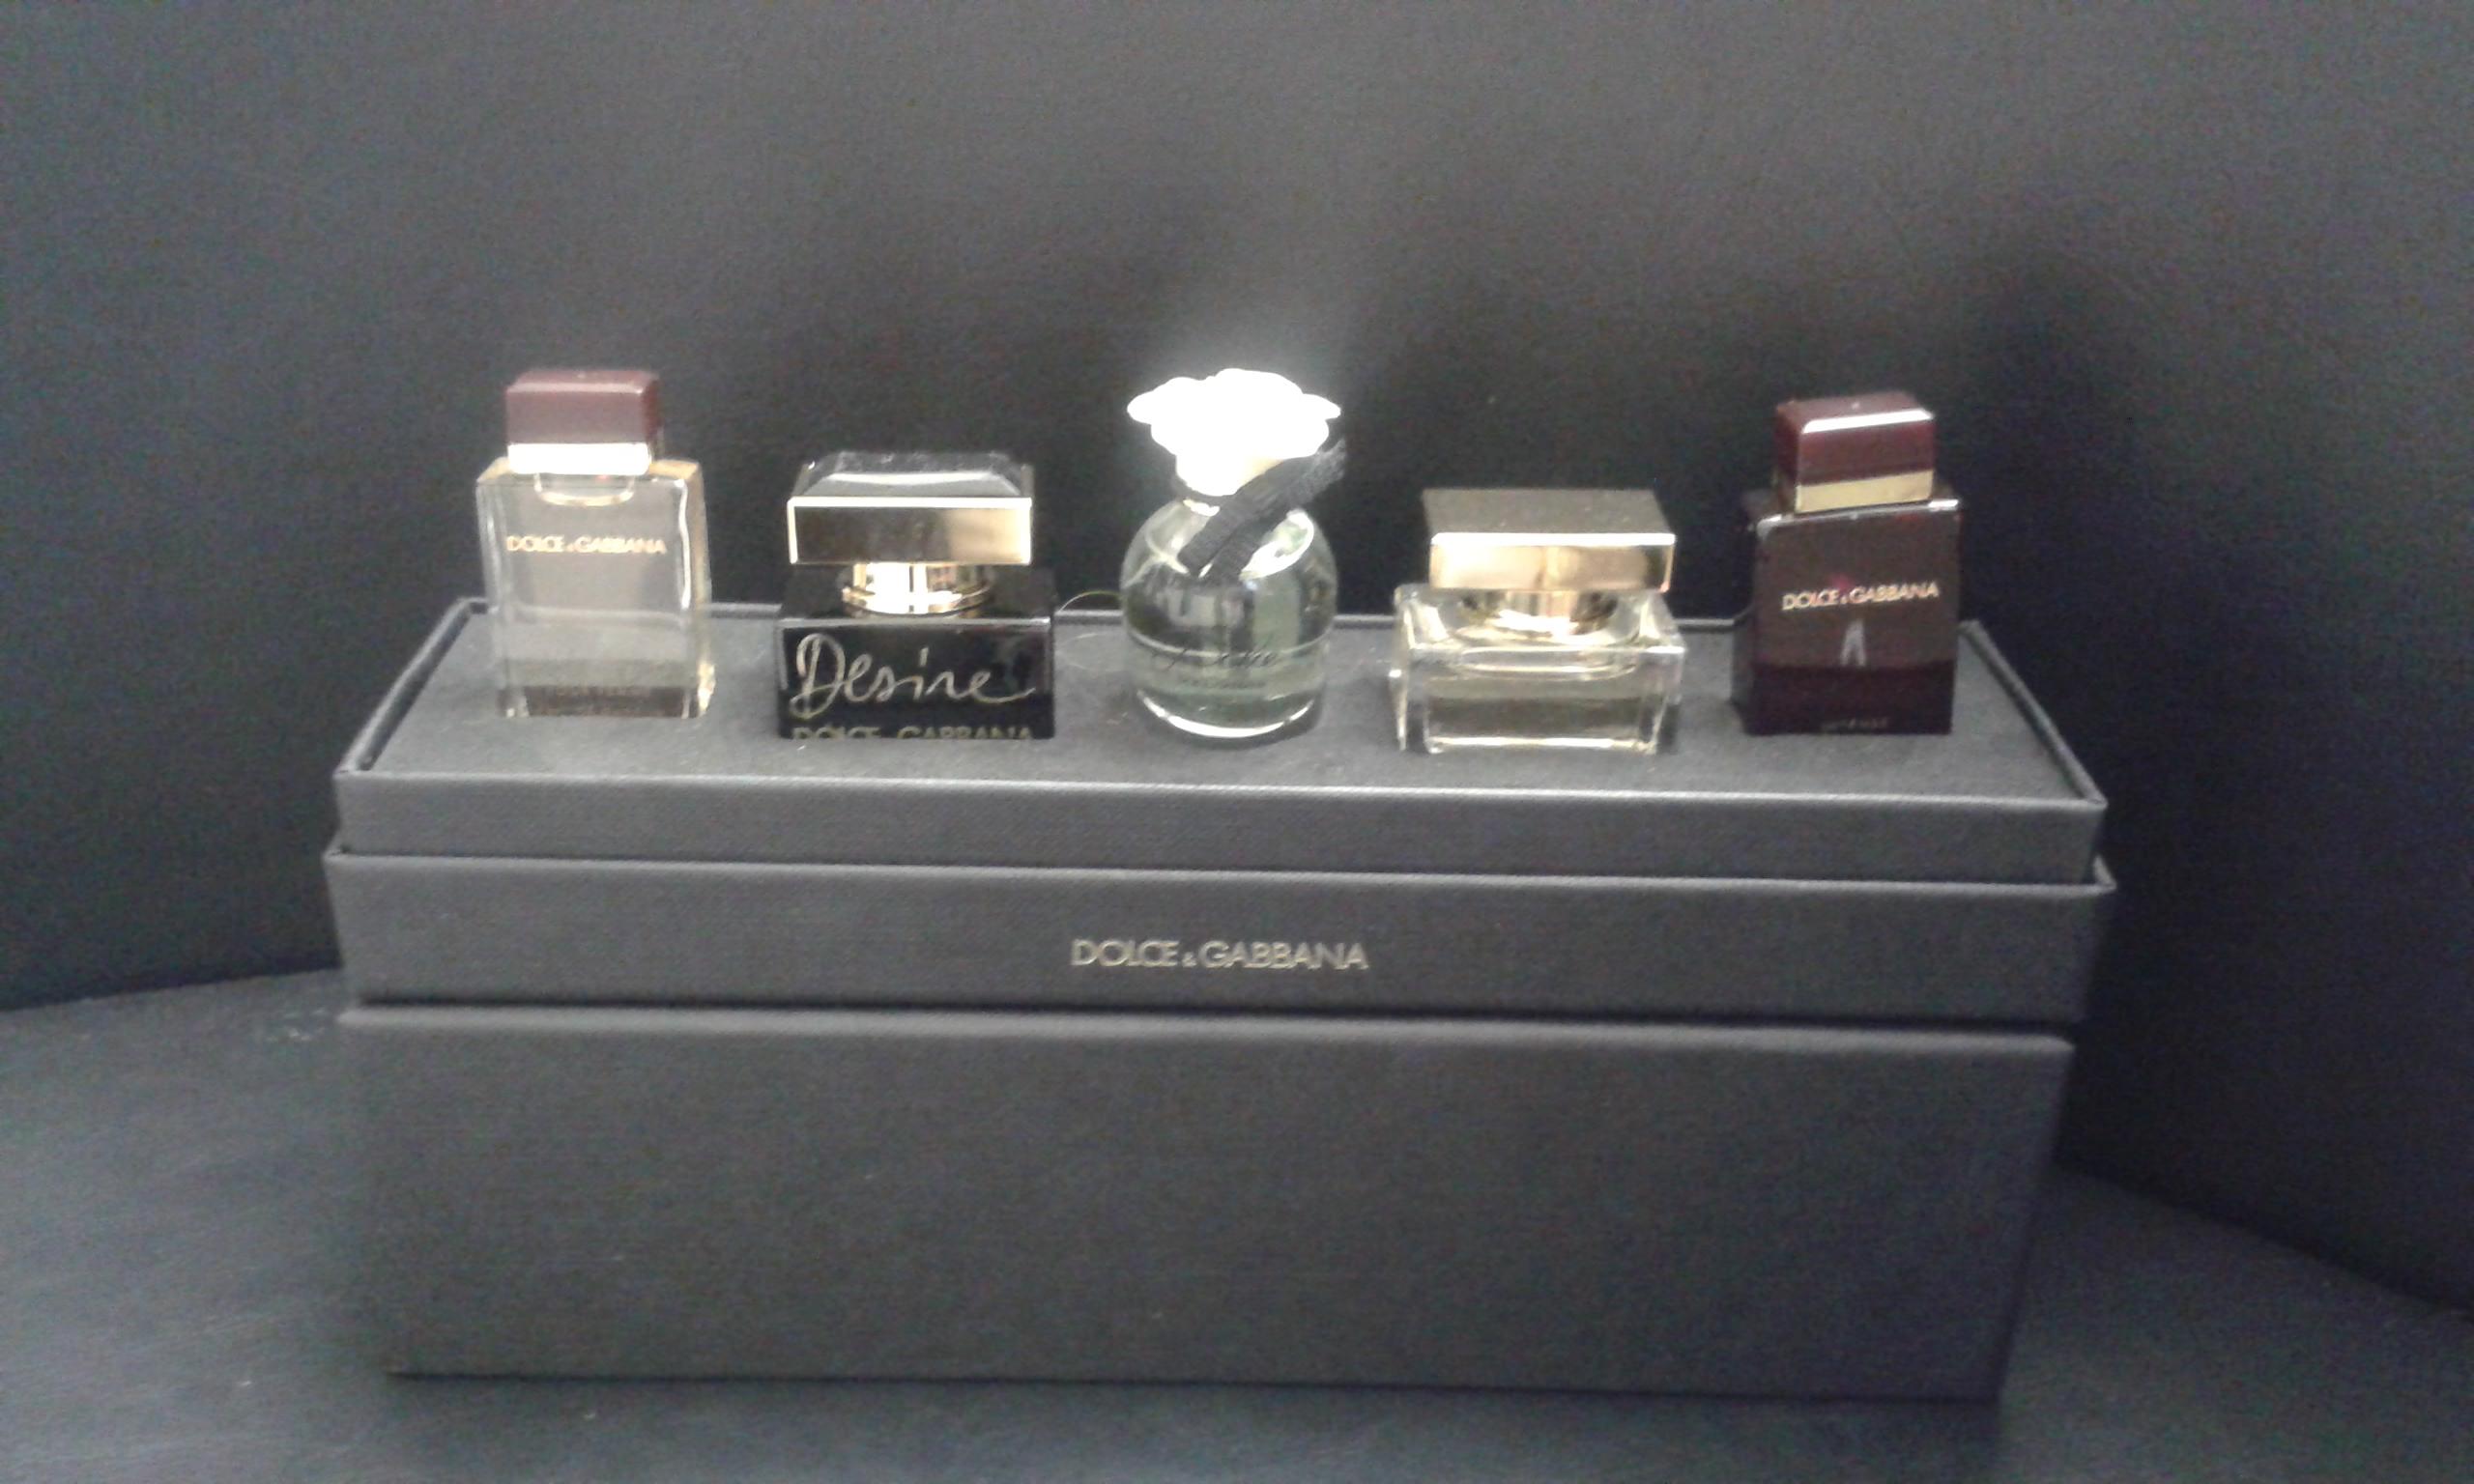 Gucci 5 Piece Mini Variety Ladies Gift Set Solippy